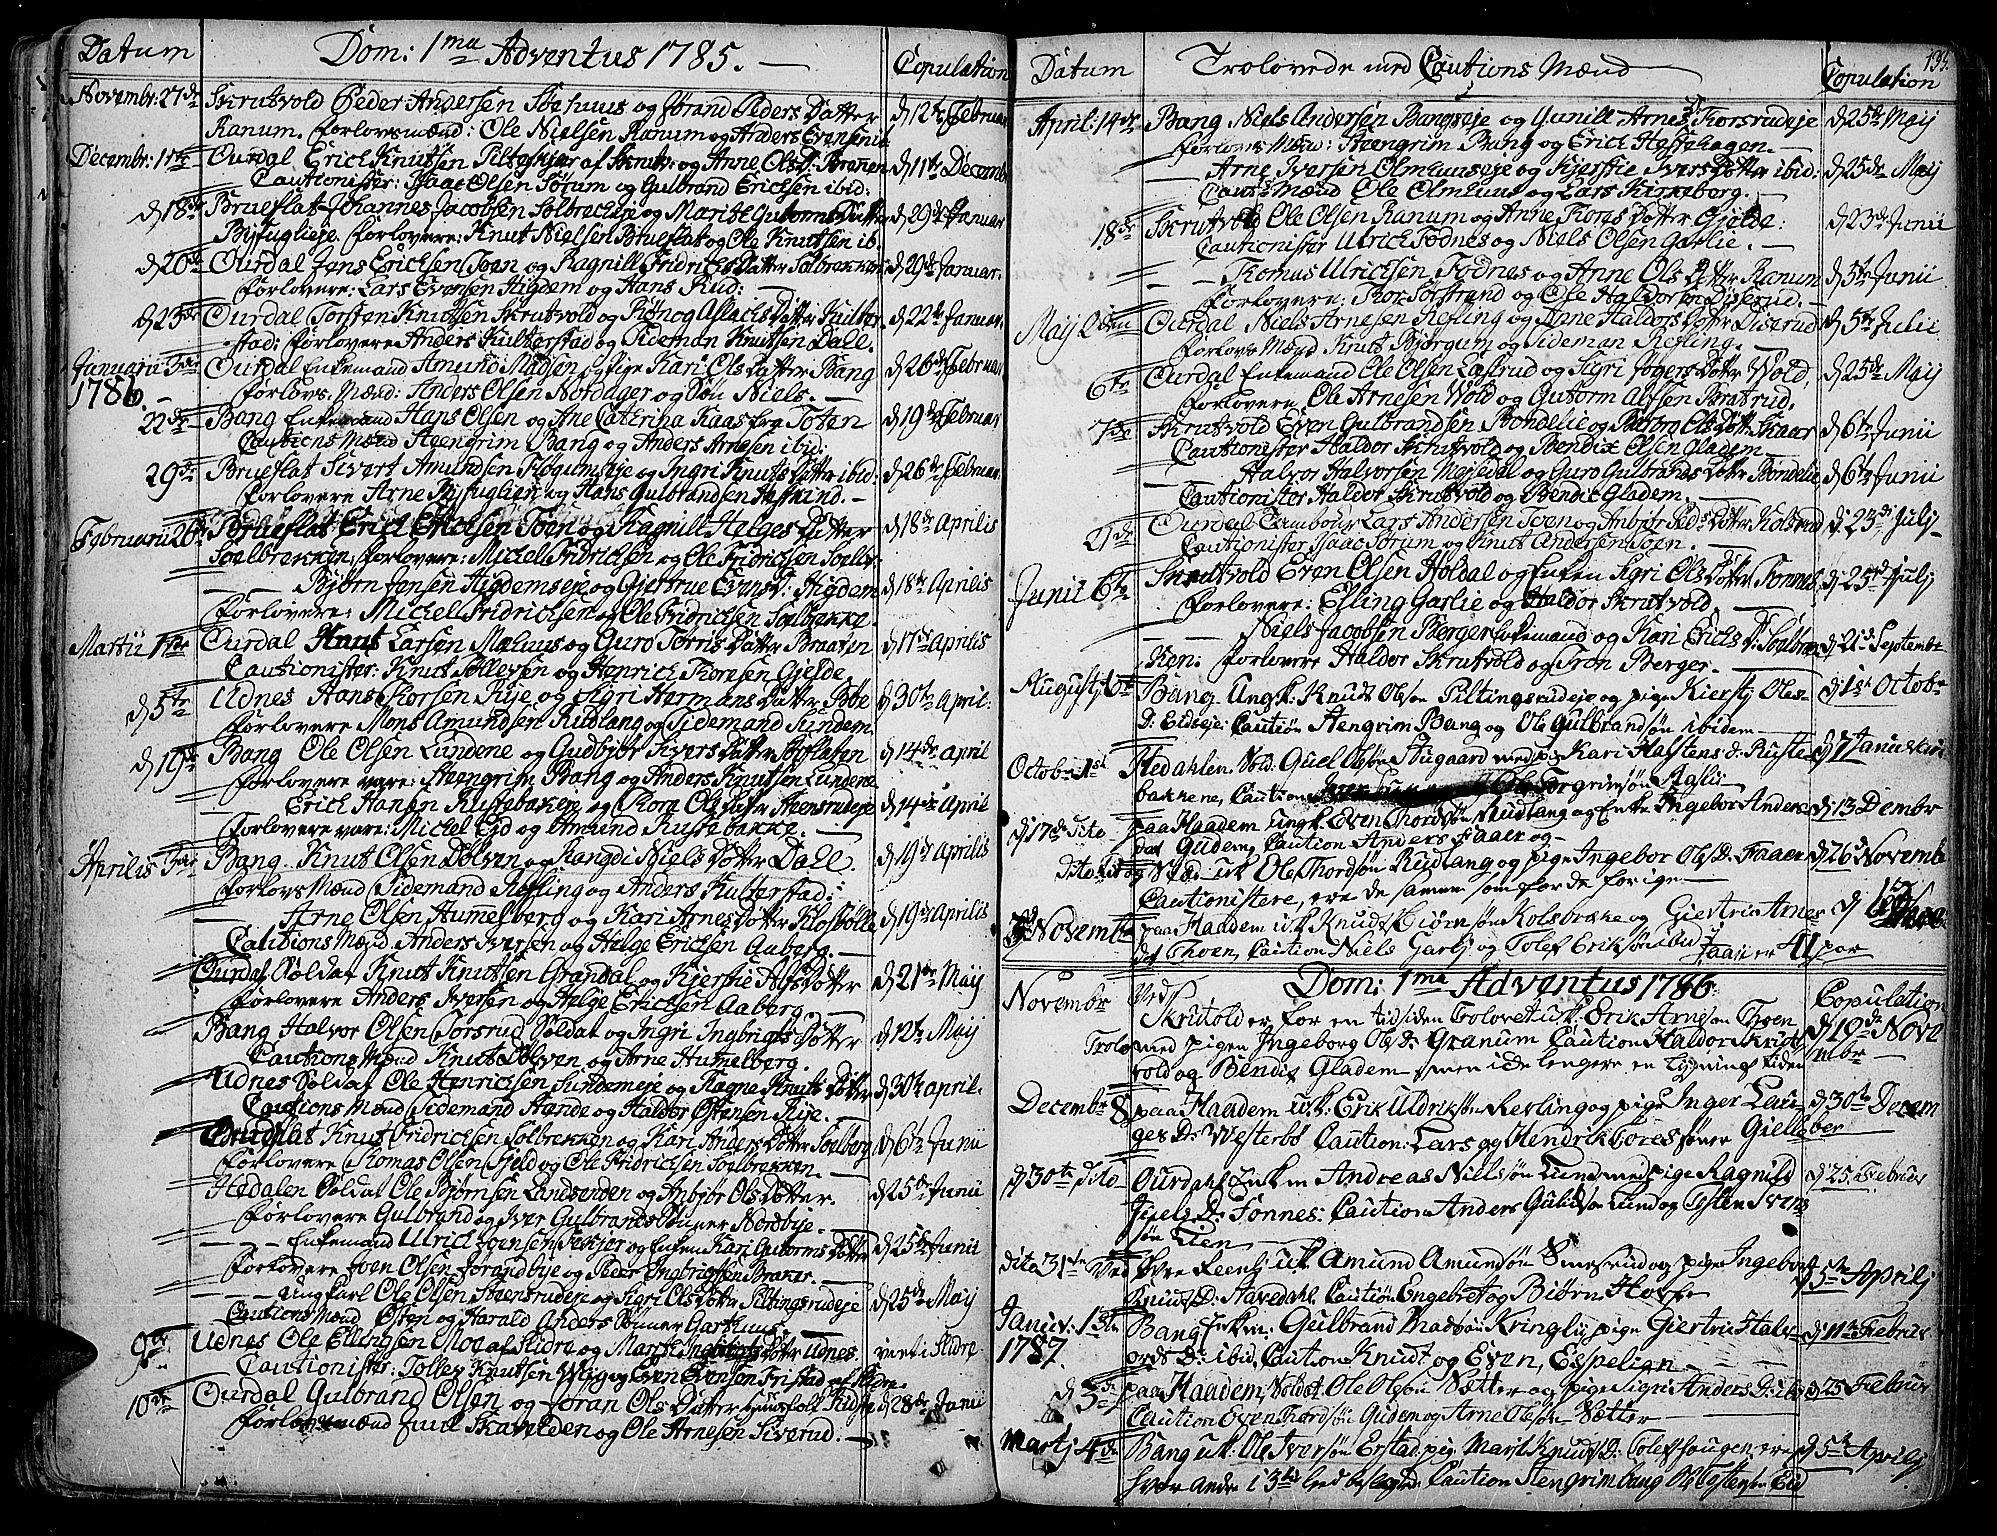 SAH, Aurdal prestekontor, Ministerialbok nr. 6, 1781-1804, s. 133